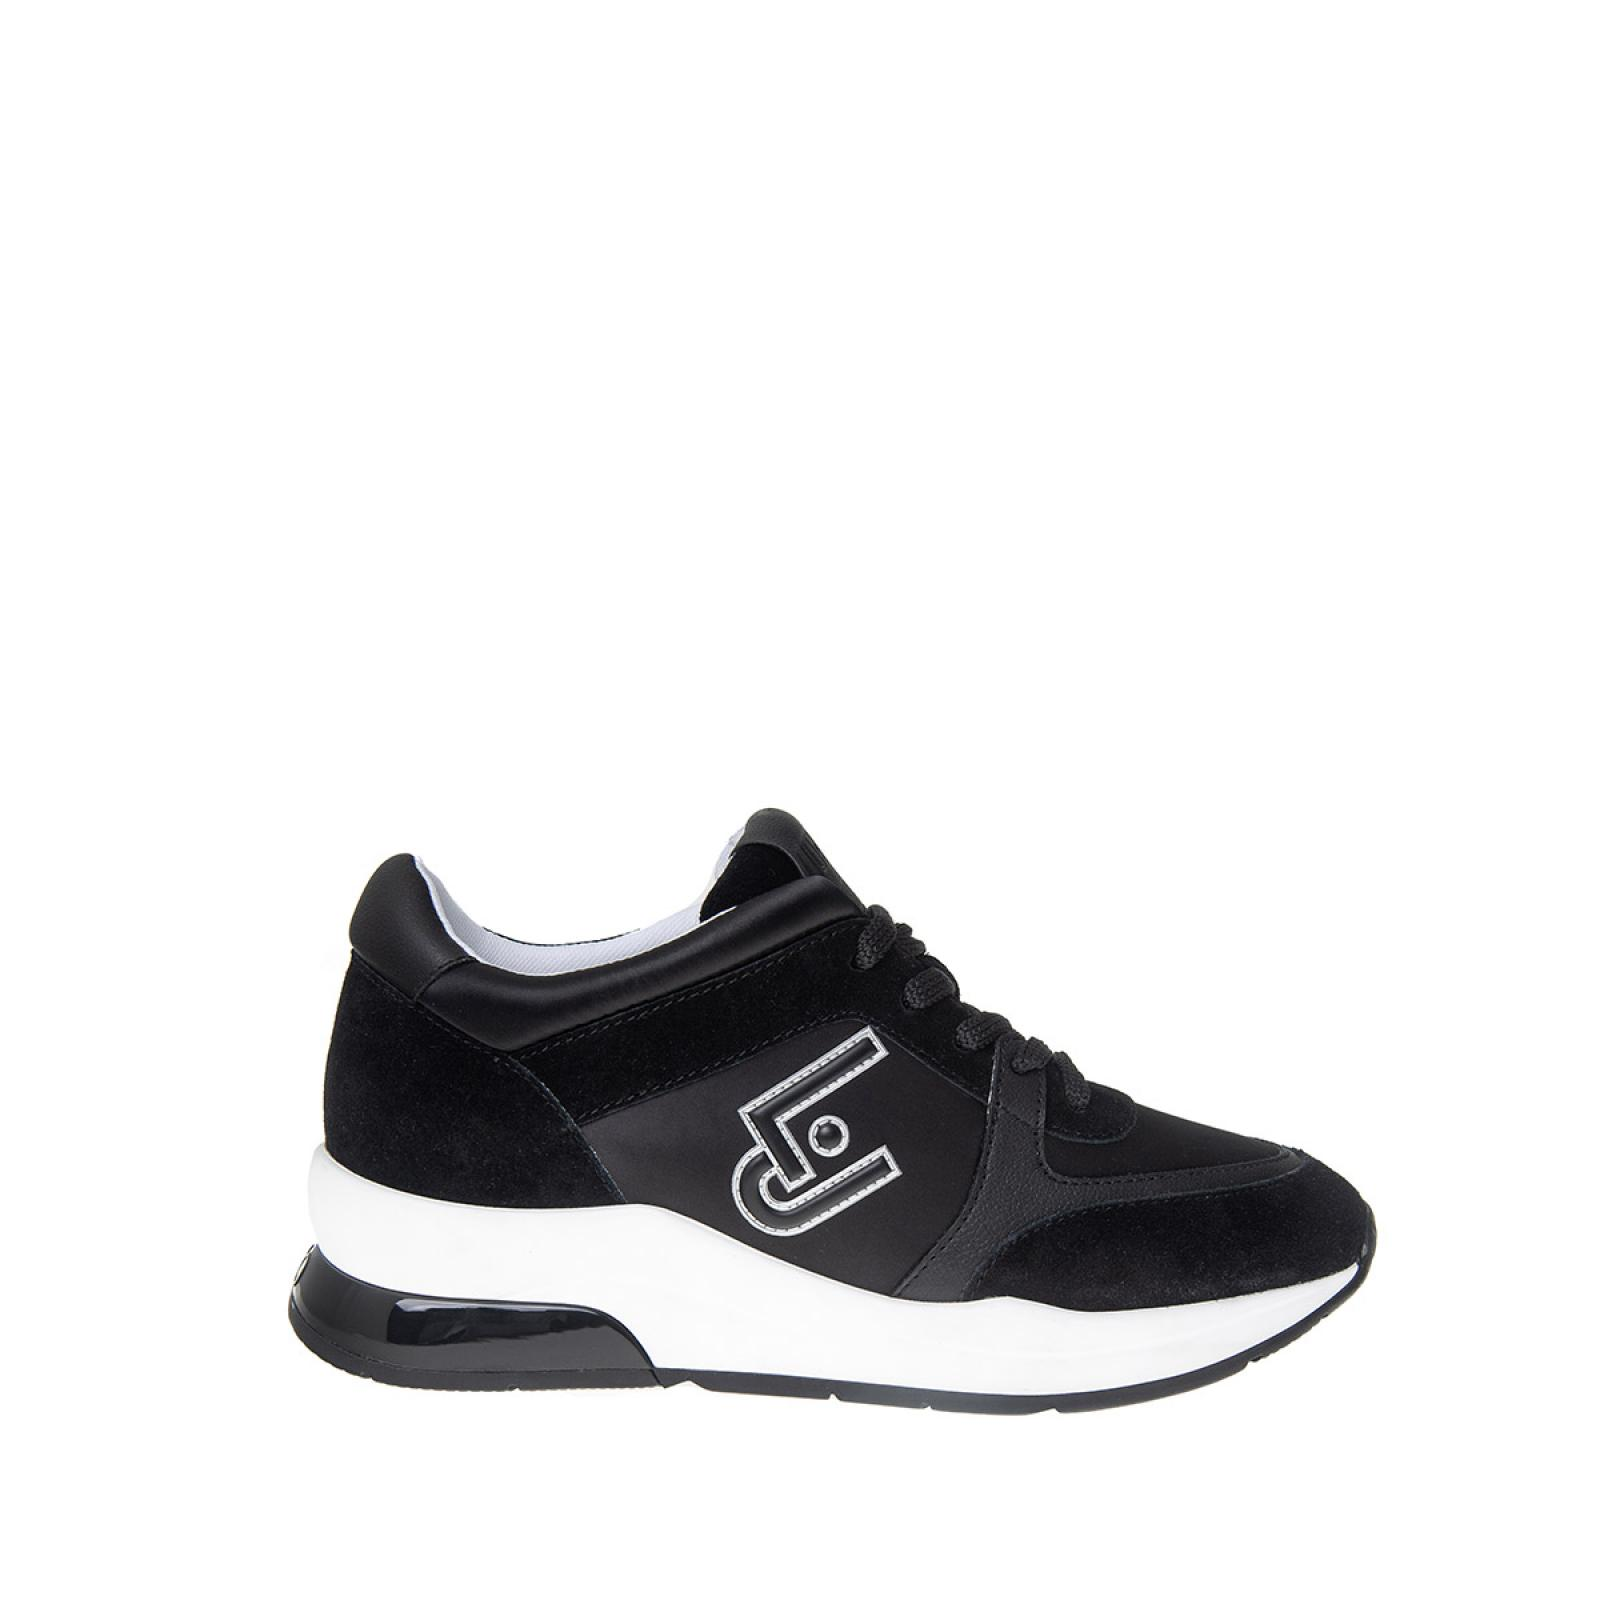 Sneakers Karlie con logo - BLACK